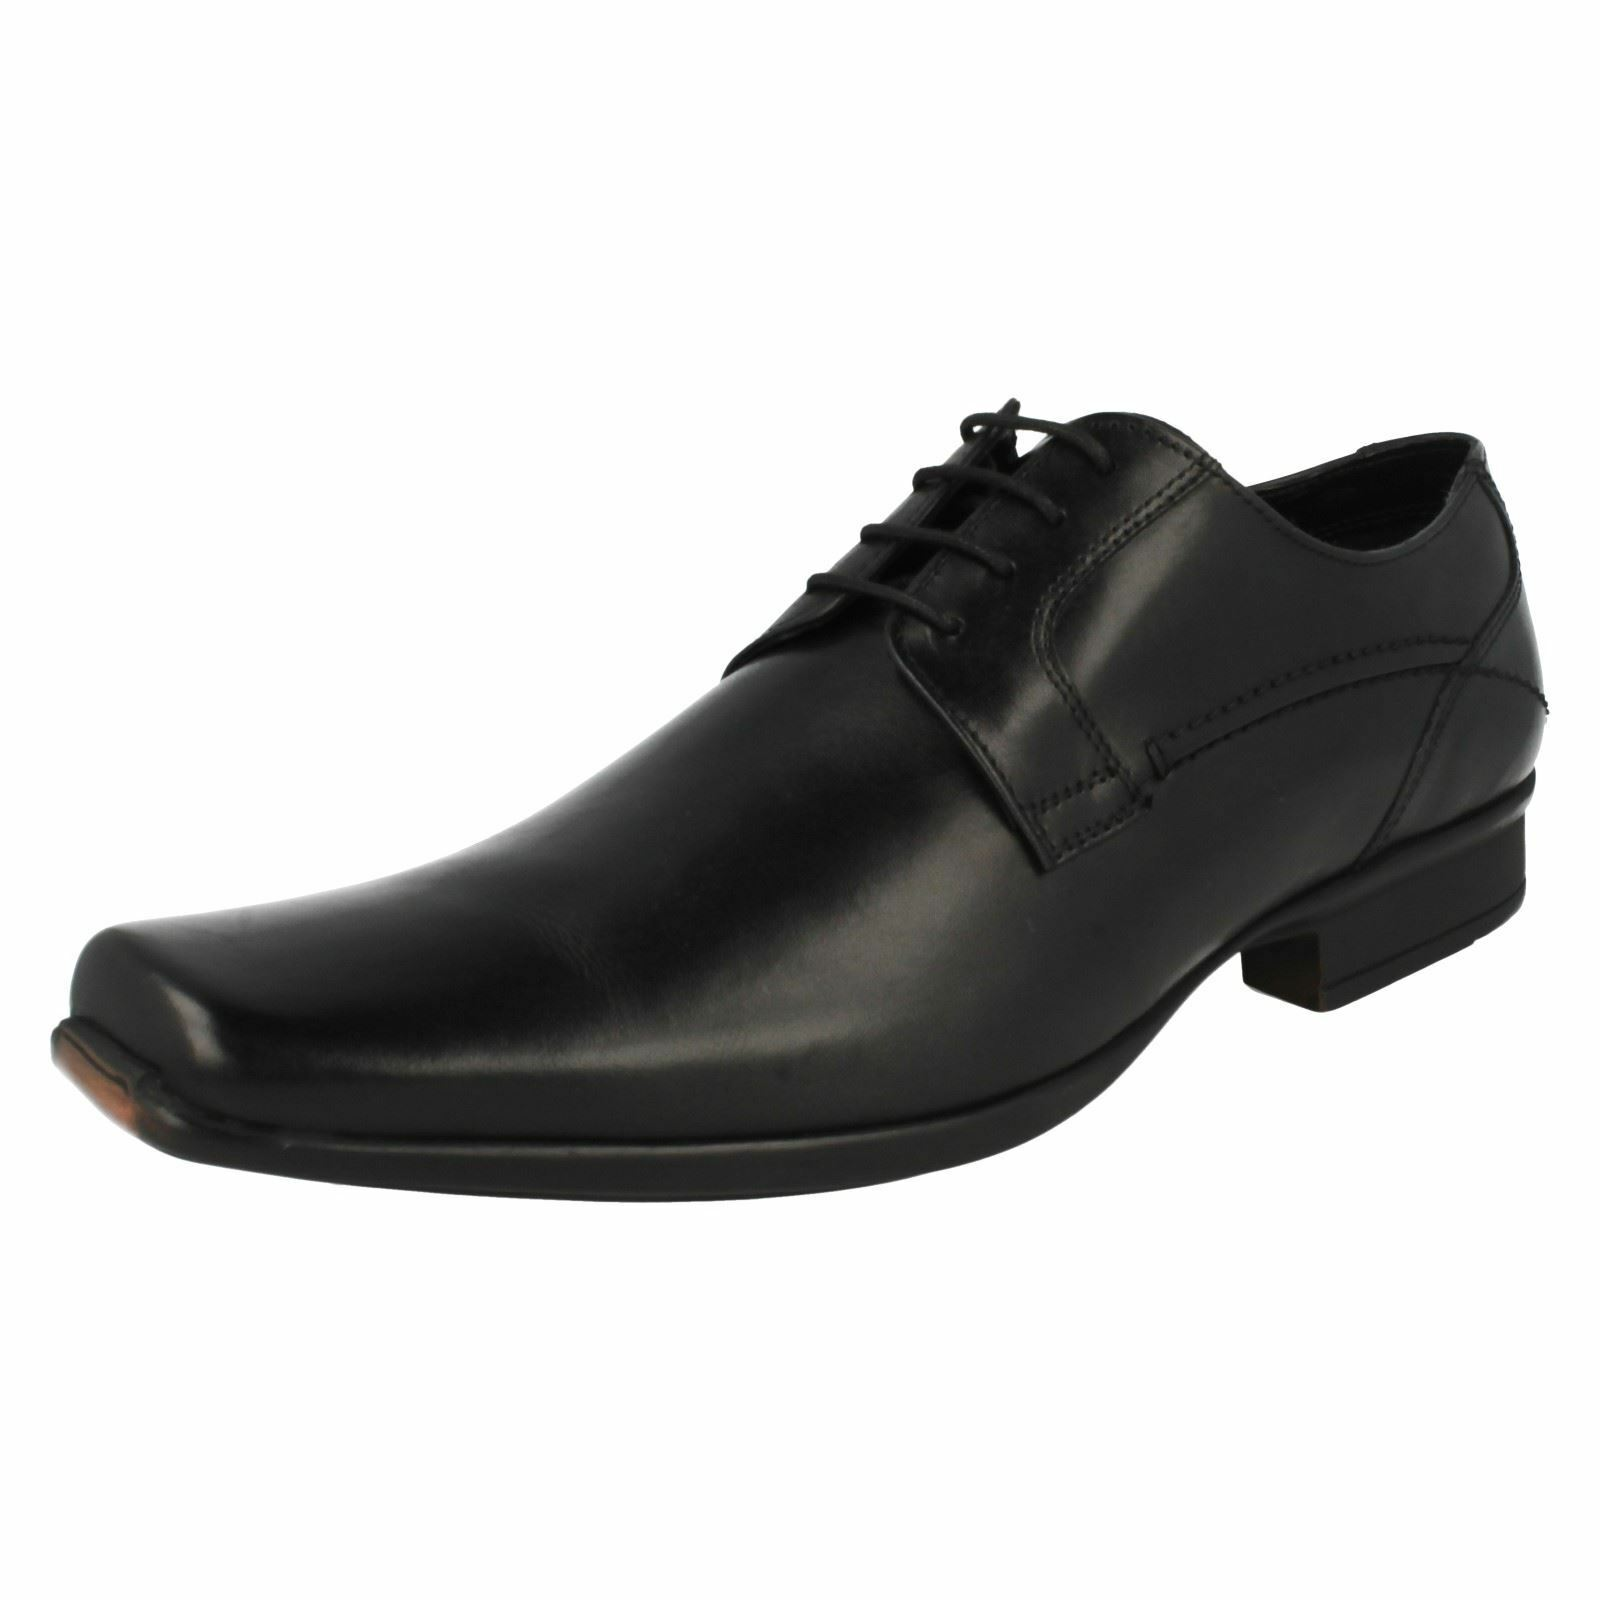 Herren Clarks ASCAR Walk schwarzes Leder Intelligente Spitzen sich Schuhe